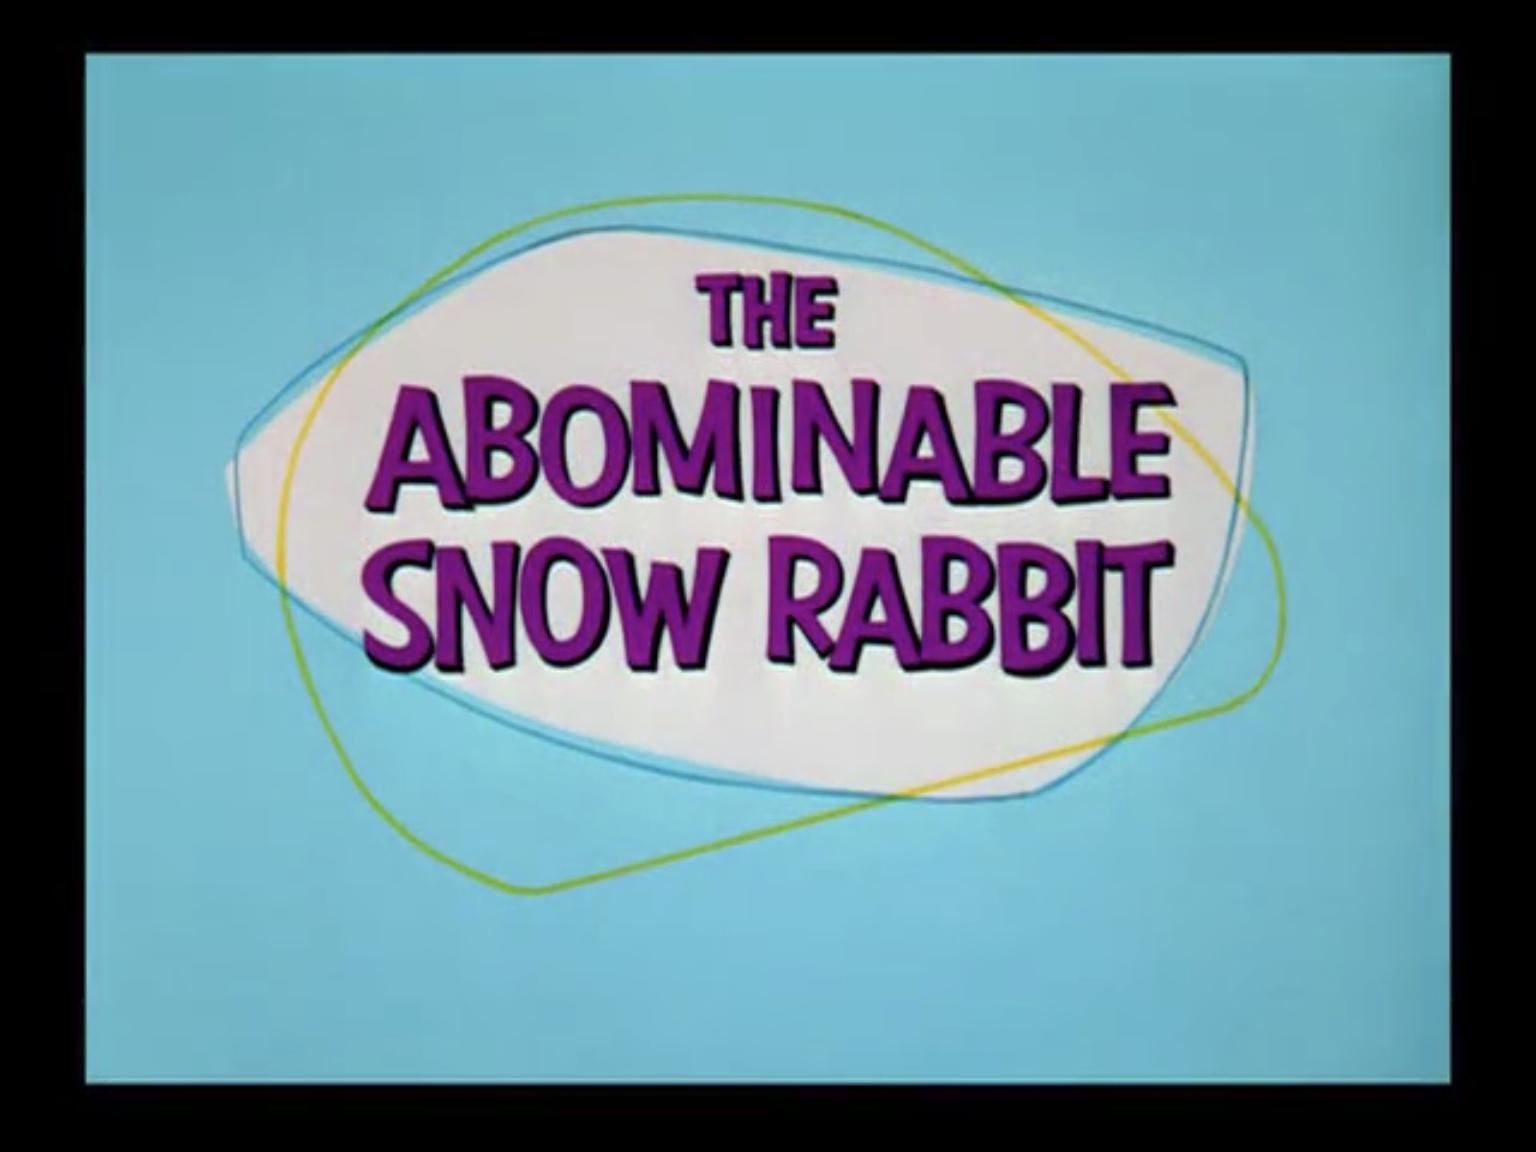 The Abominable Snow Rabbit Wikipedia